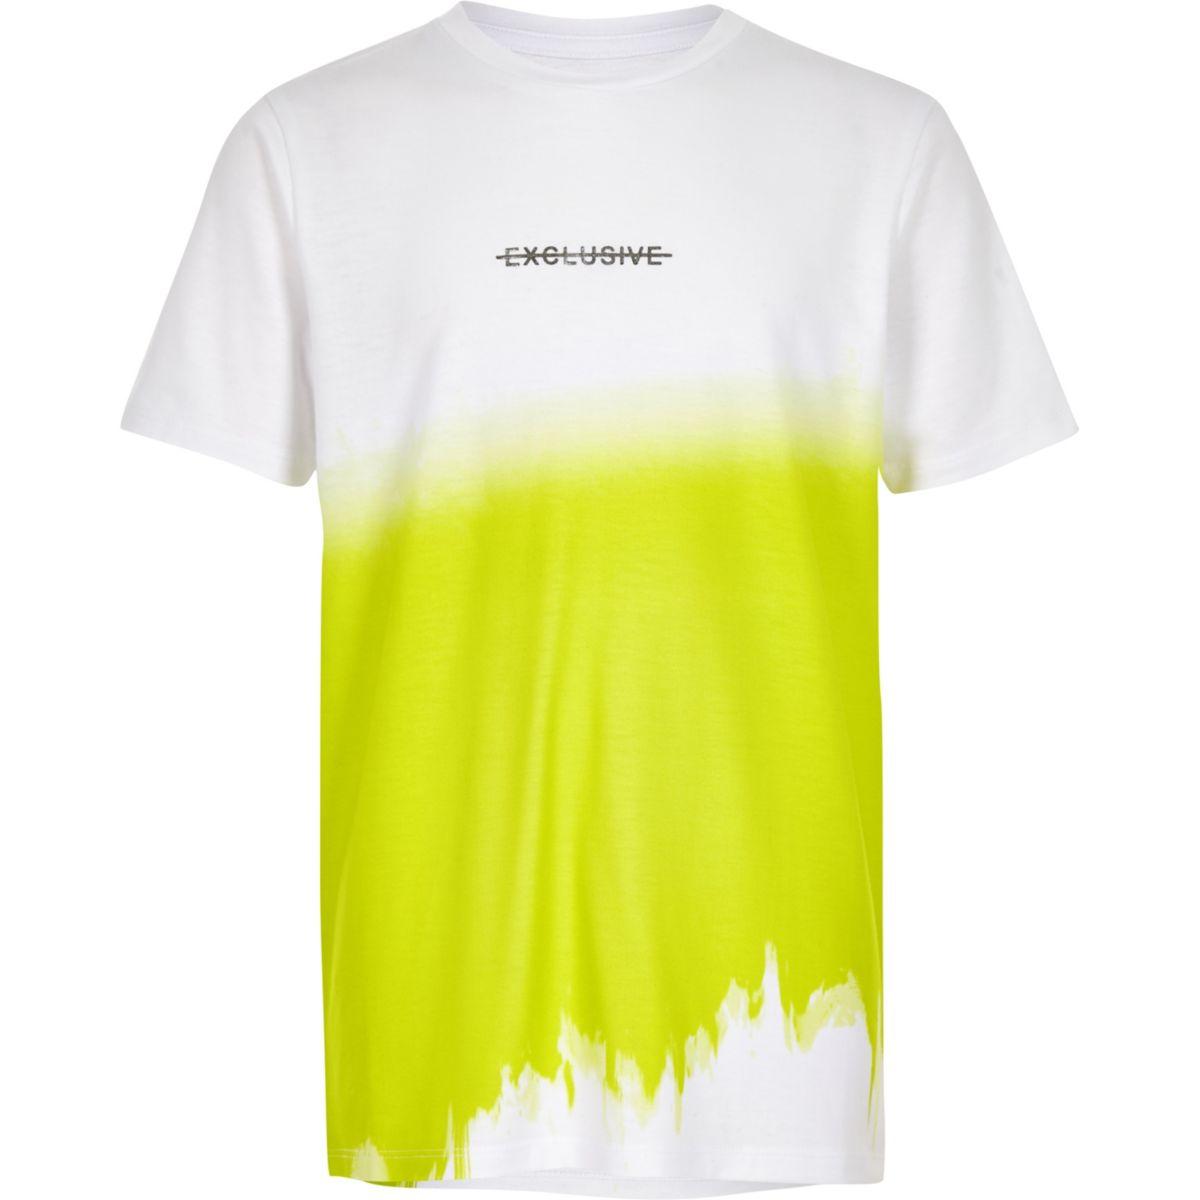 Boys white 'exclusive' print T-shirt